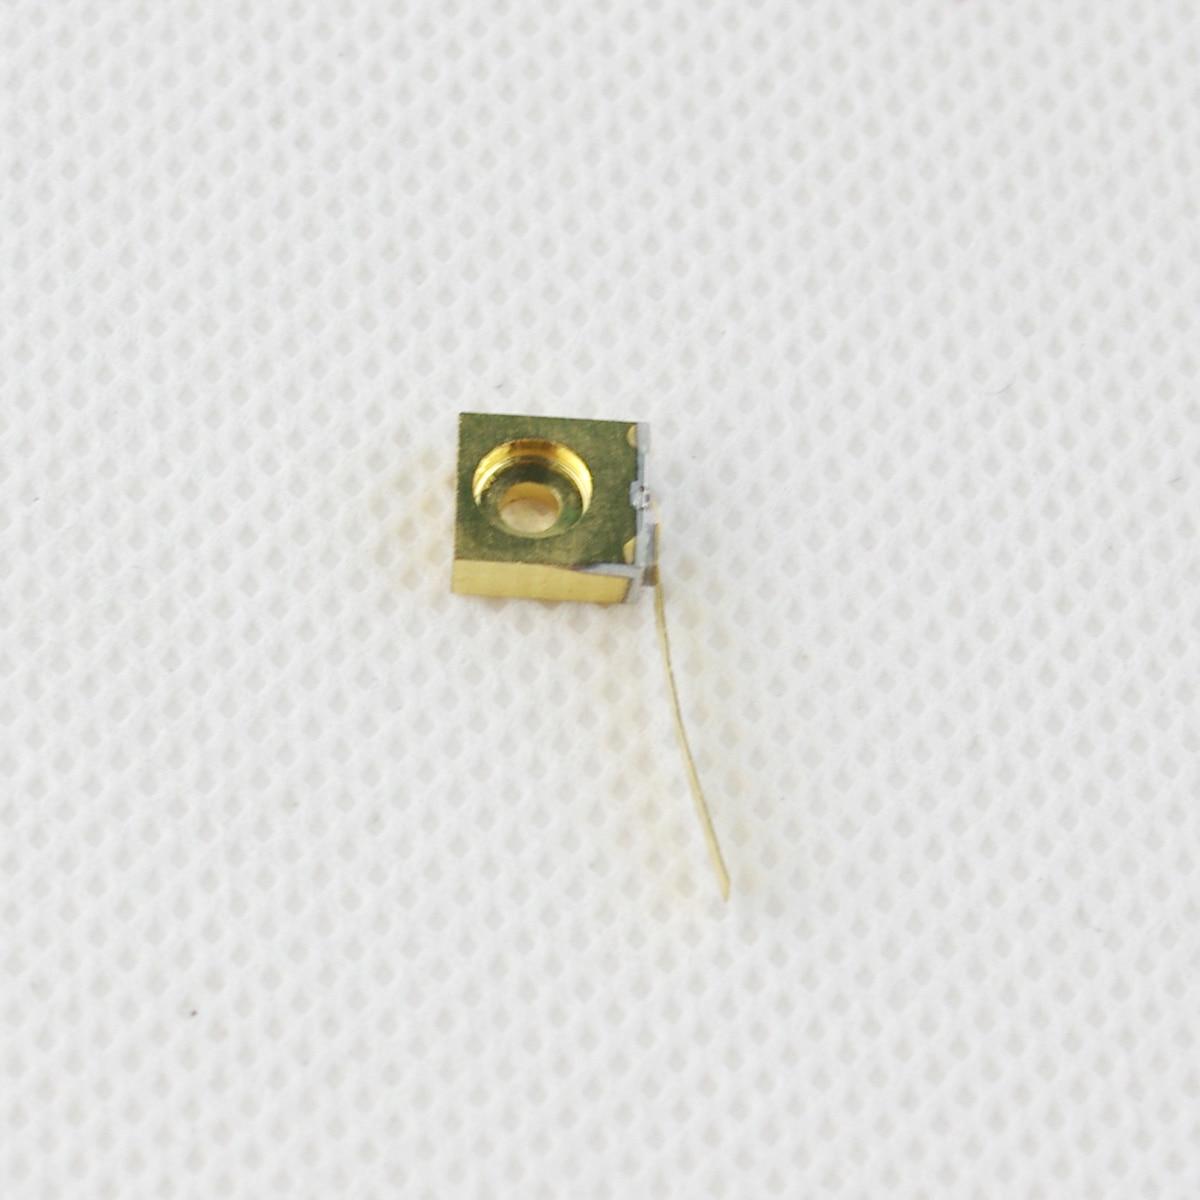 C-mount Package 810n 5 w de Alta Potência 5000 mw 808nm Infravermelho IR Laser Diode LD FAC